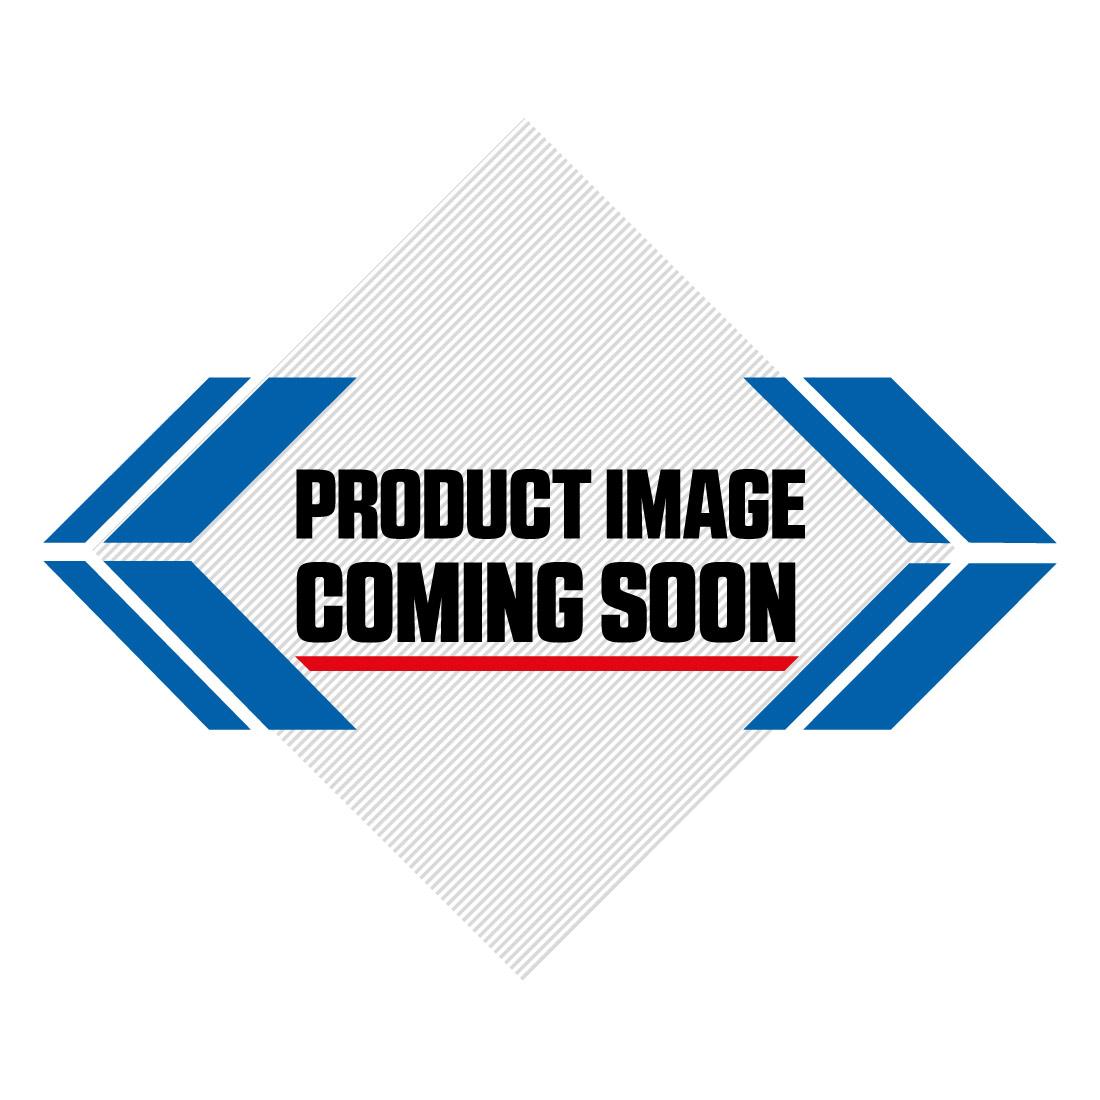 DJI Goggles - Immersive FPV Goggles Image-3